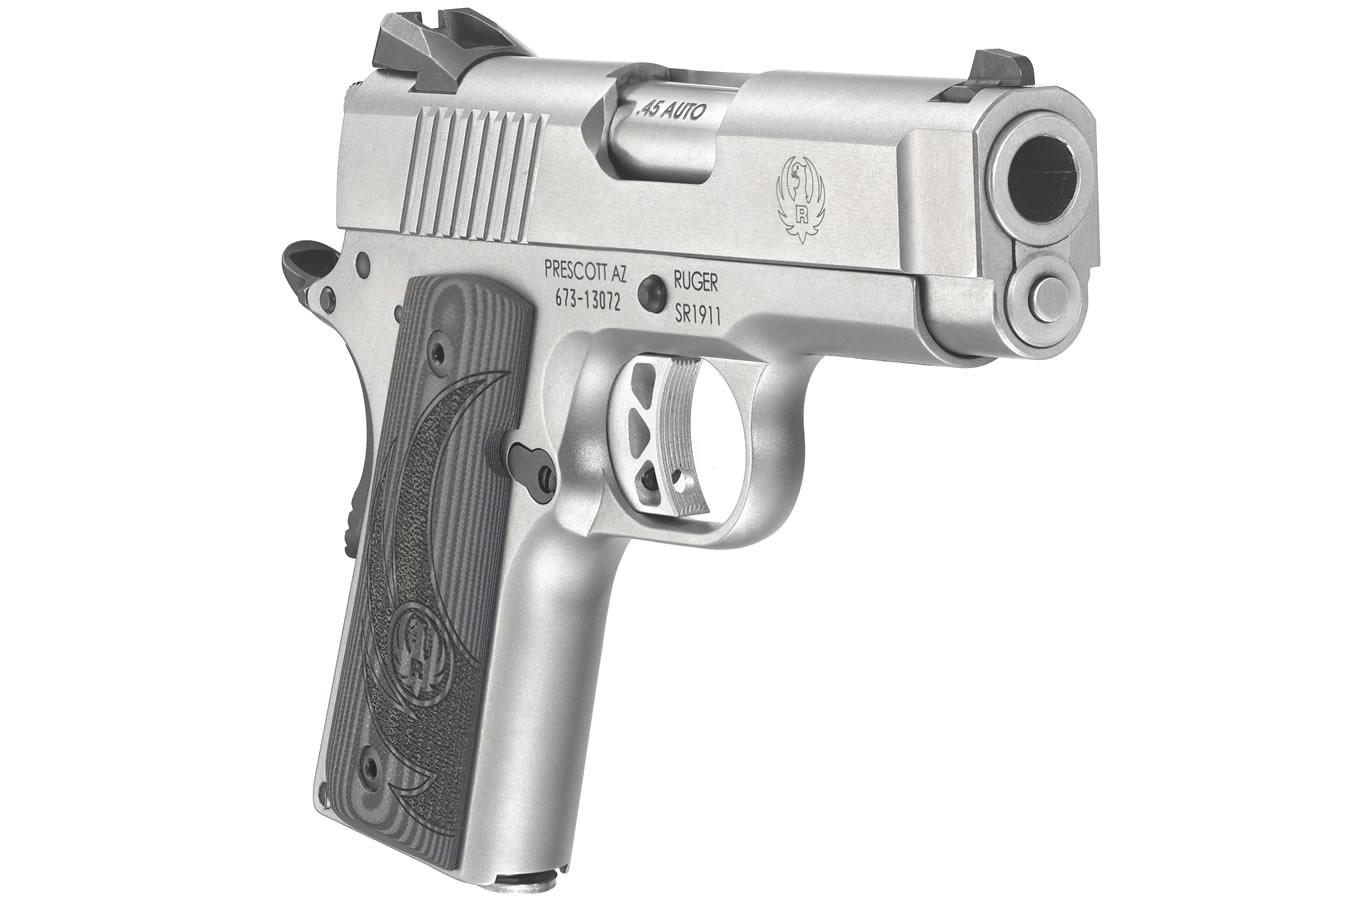 Ruger SR1911 45 ACP Officer-Style Pistol | Sportsman's ...